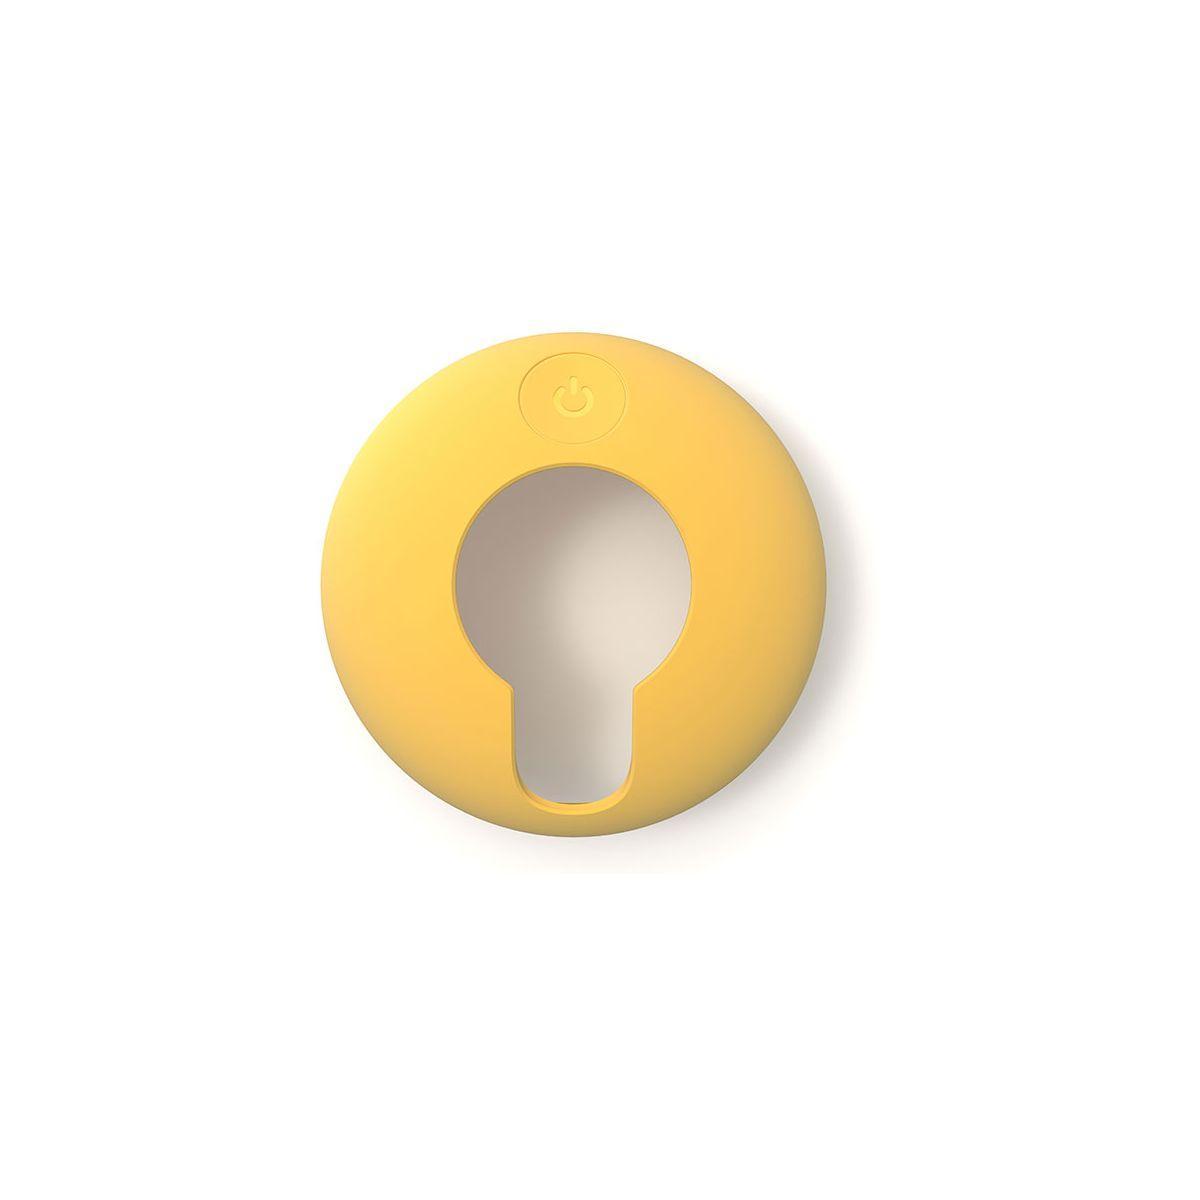 Coque tomtom coque protection silicone jaune vio (photo)